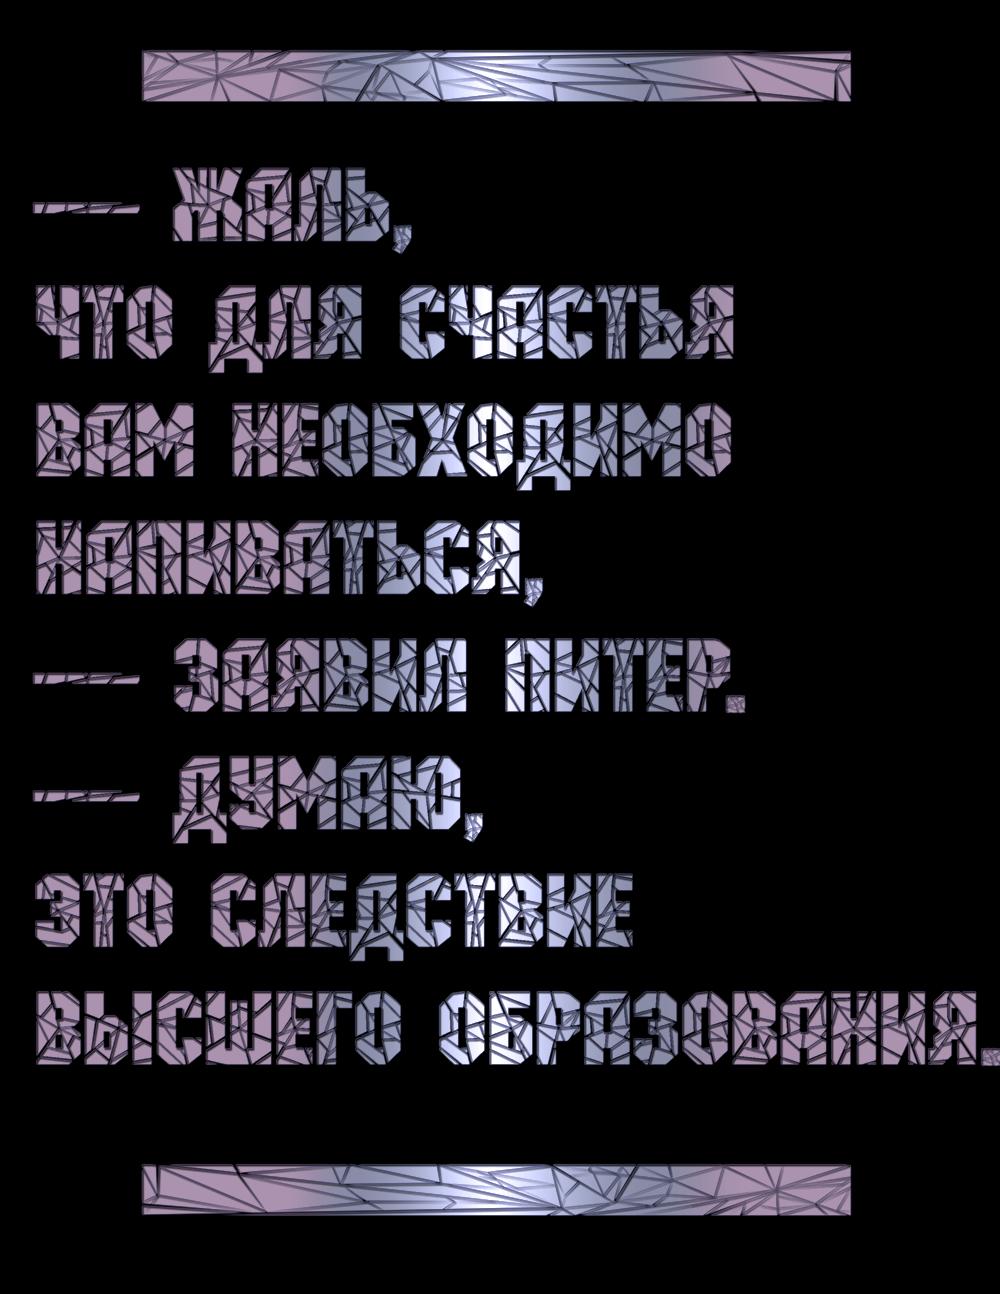 http://s5.uploads.ru/n1TJf.png